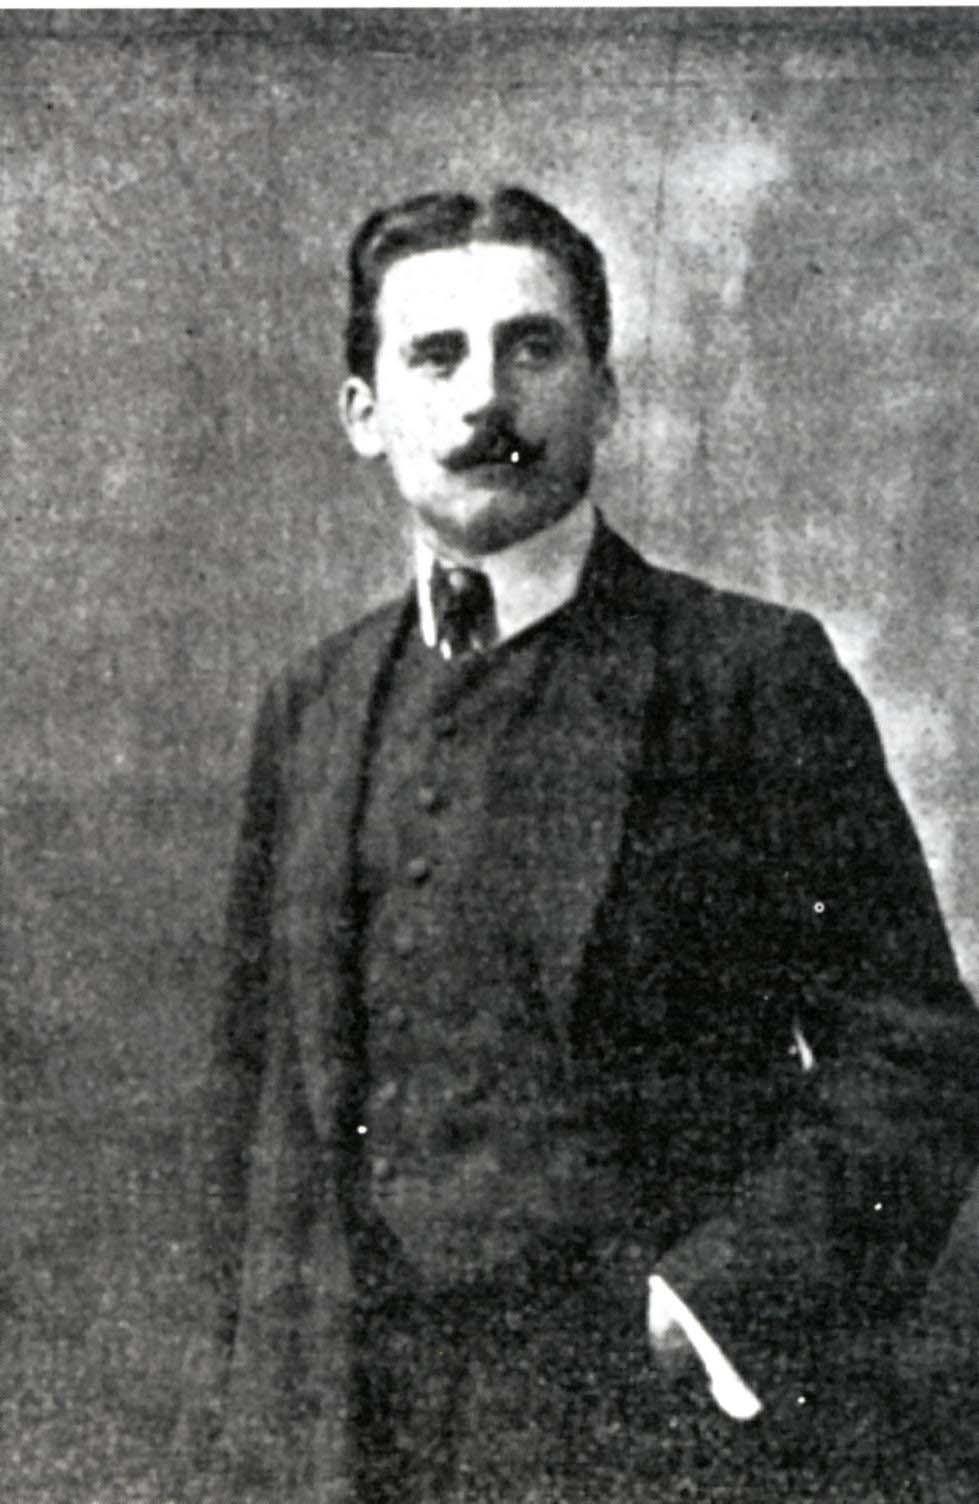 Image of Ernesto Aurini from Wikidata